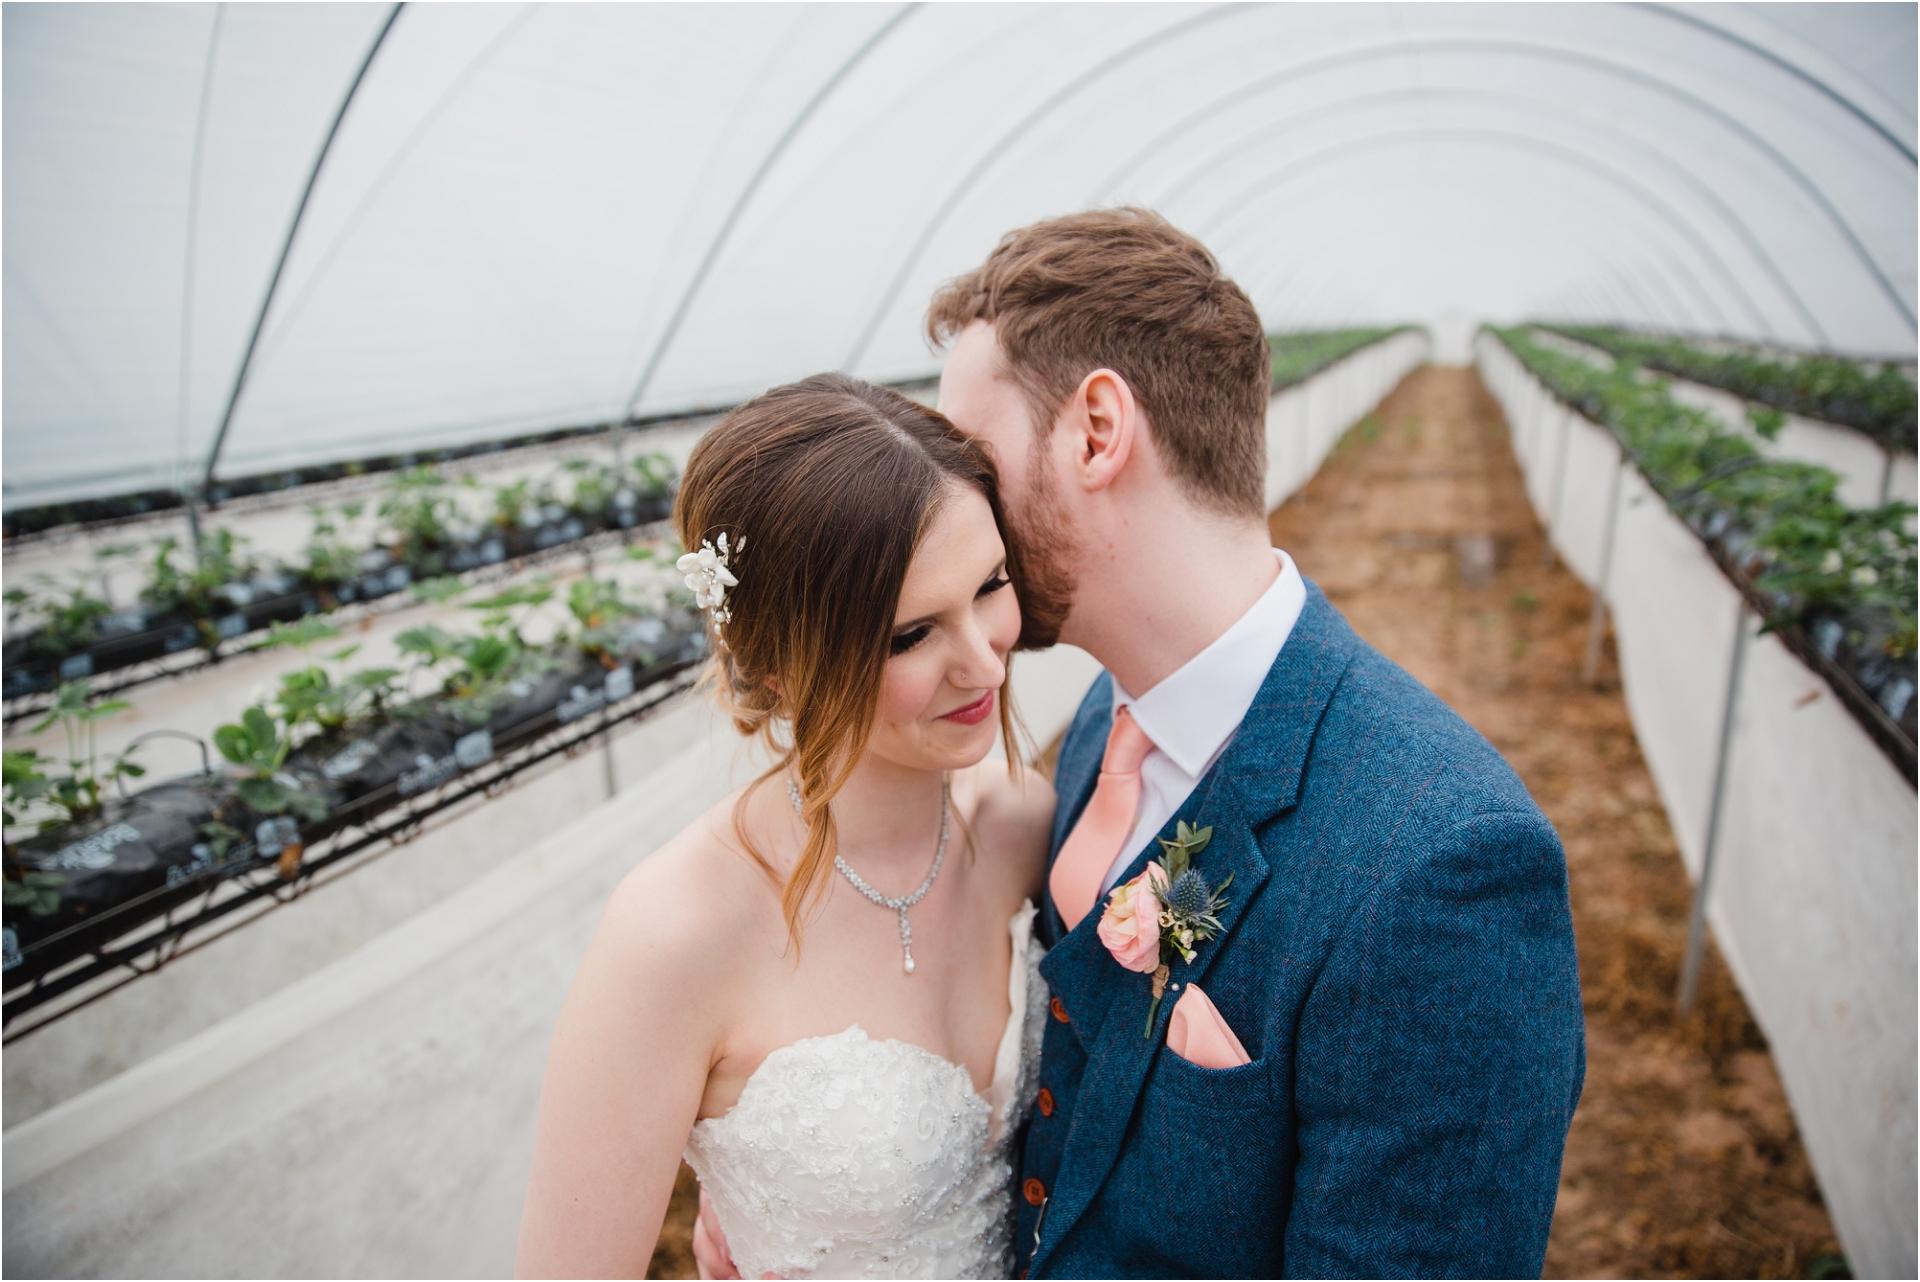 Rainy wedding at Norwood Park